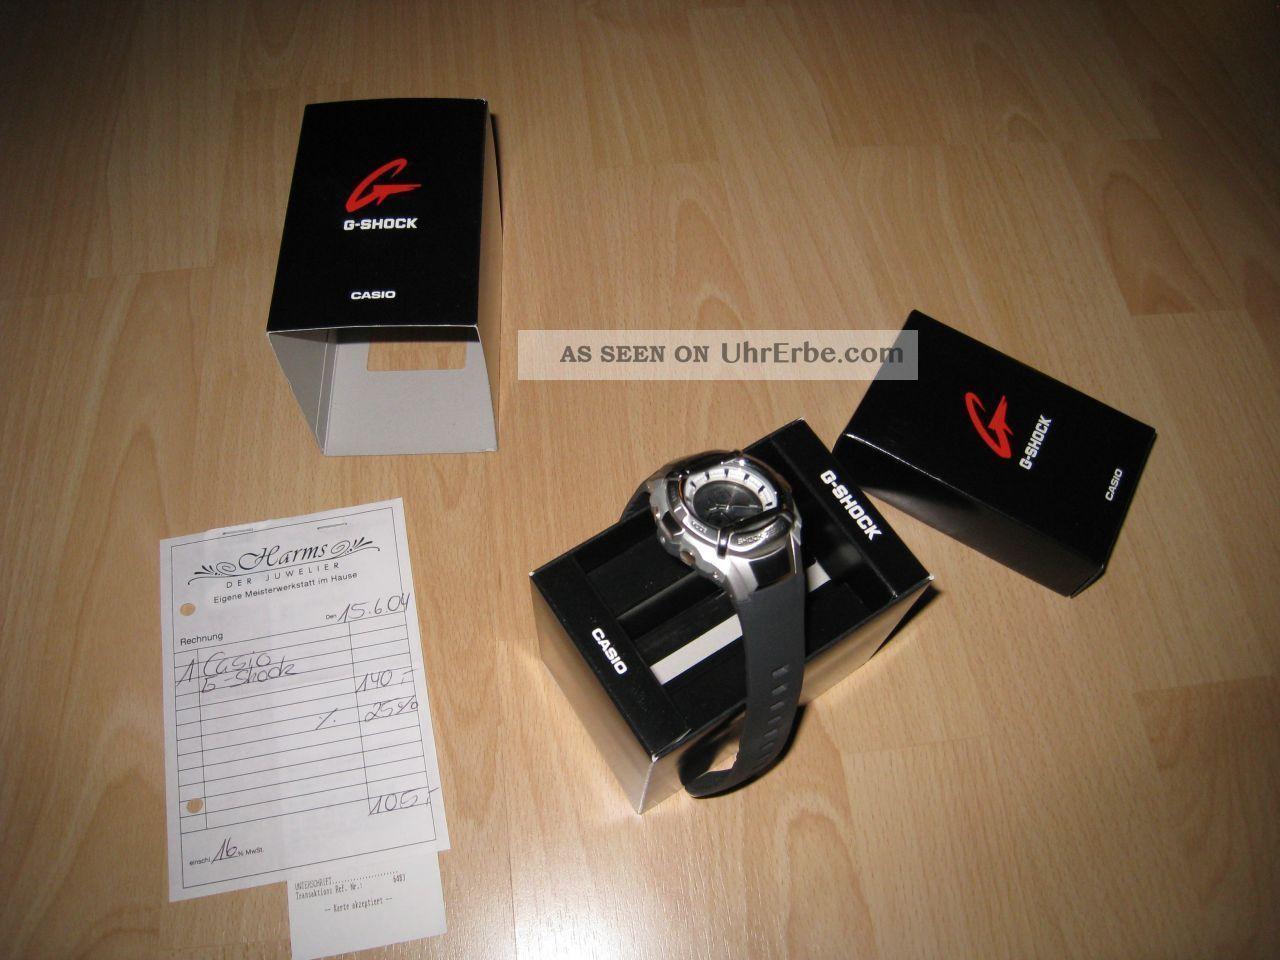 Casio G - Shock Herren Armbanduhr G - 511d - 2aver - Gut Erhalten,  Kaum Getragen Armbanduhren Bild